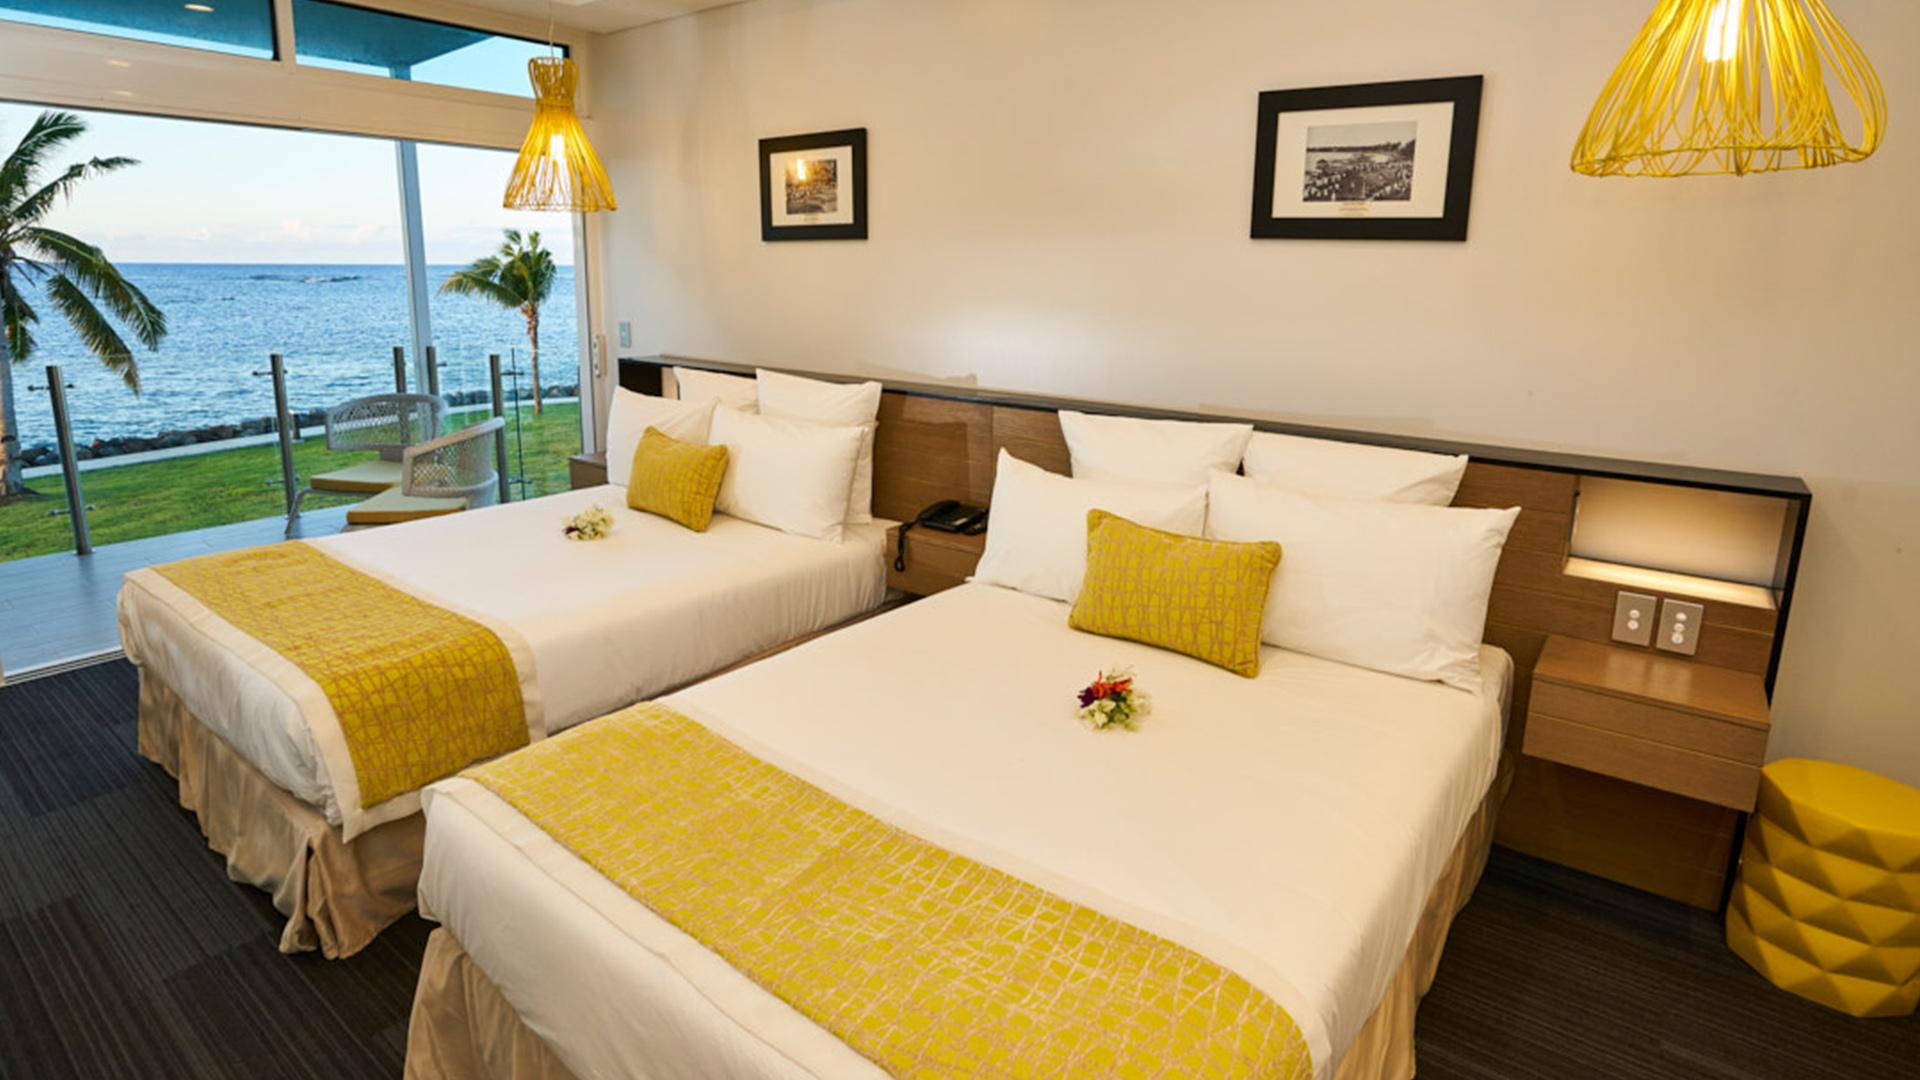 Oceanview Room Double image 1 at Taumeasina Island Resort by null, Tuamasaga, Samoa